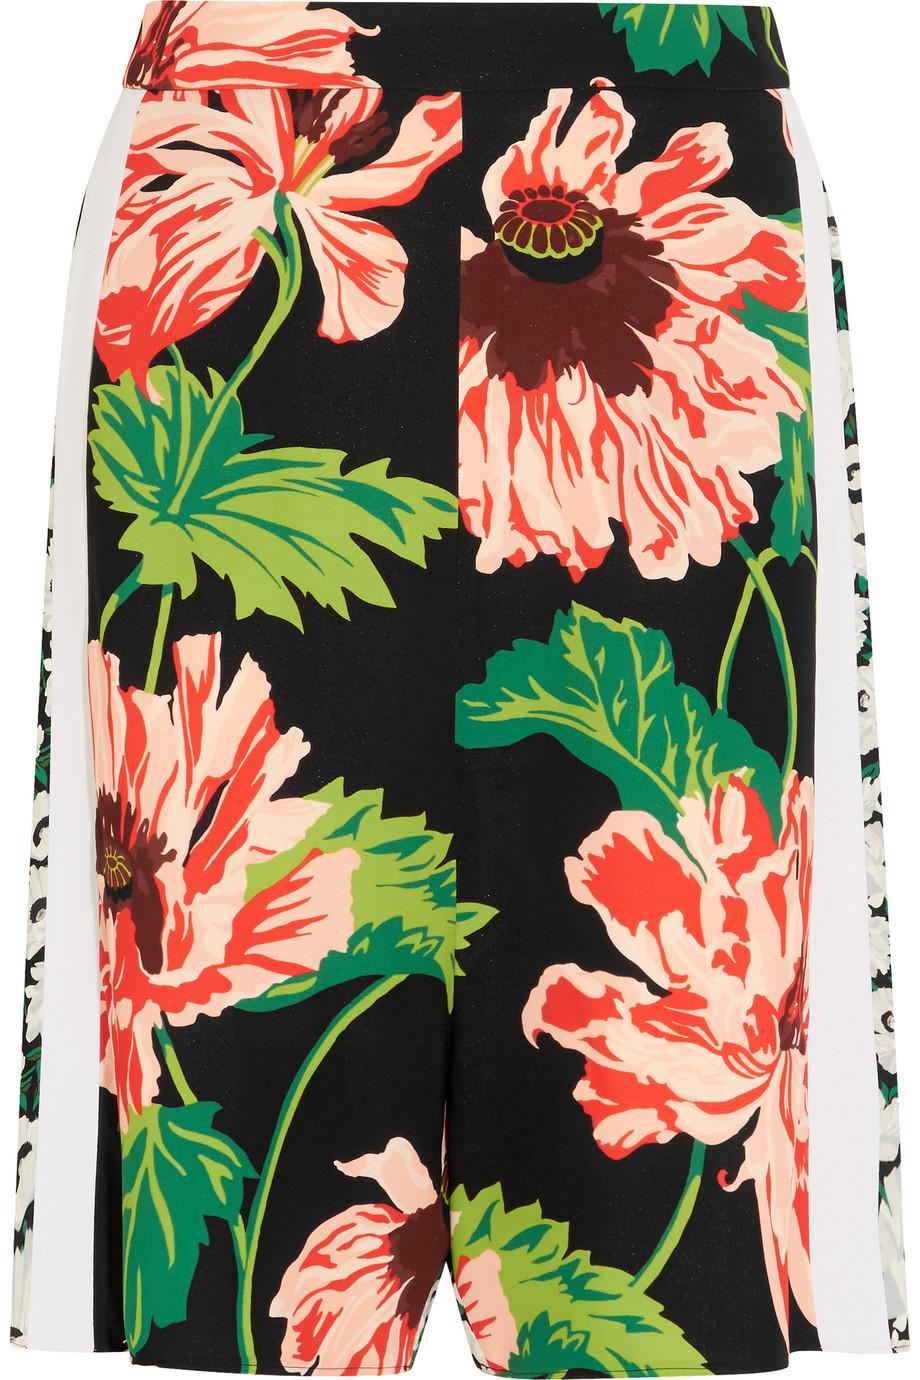 Stella Mccartney Zandra Floral-Print Stretch-Crepe Shorts, Pink/Green, Women's, Size: 40